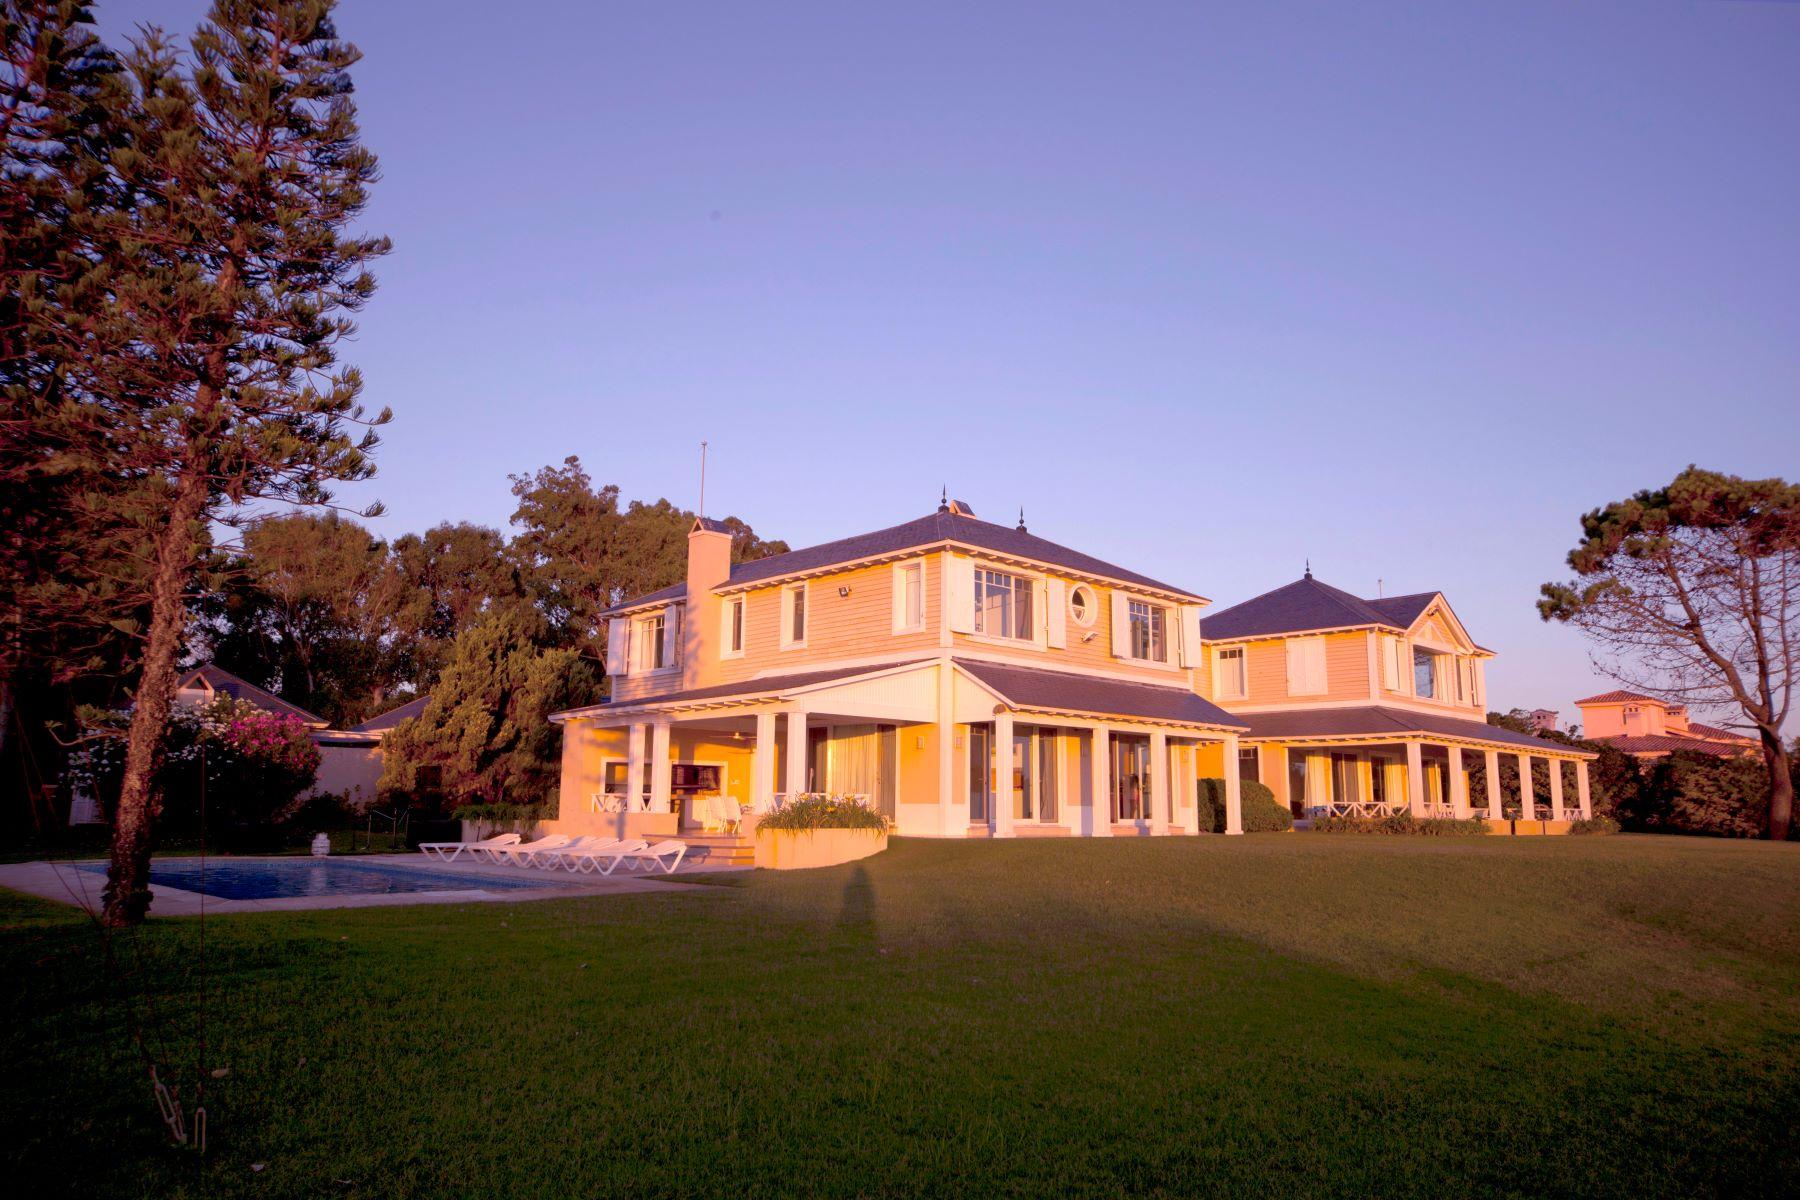 Single Family Home for Sale at Brisa Other Maldonado, Maldonado, Uruguay